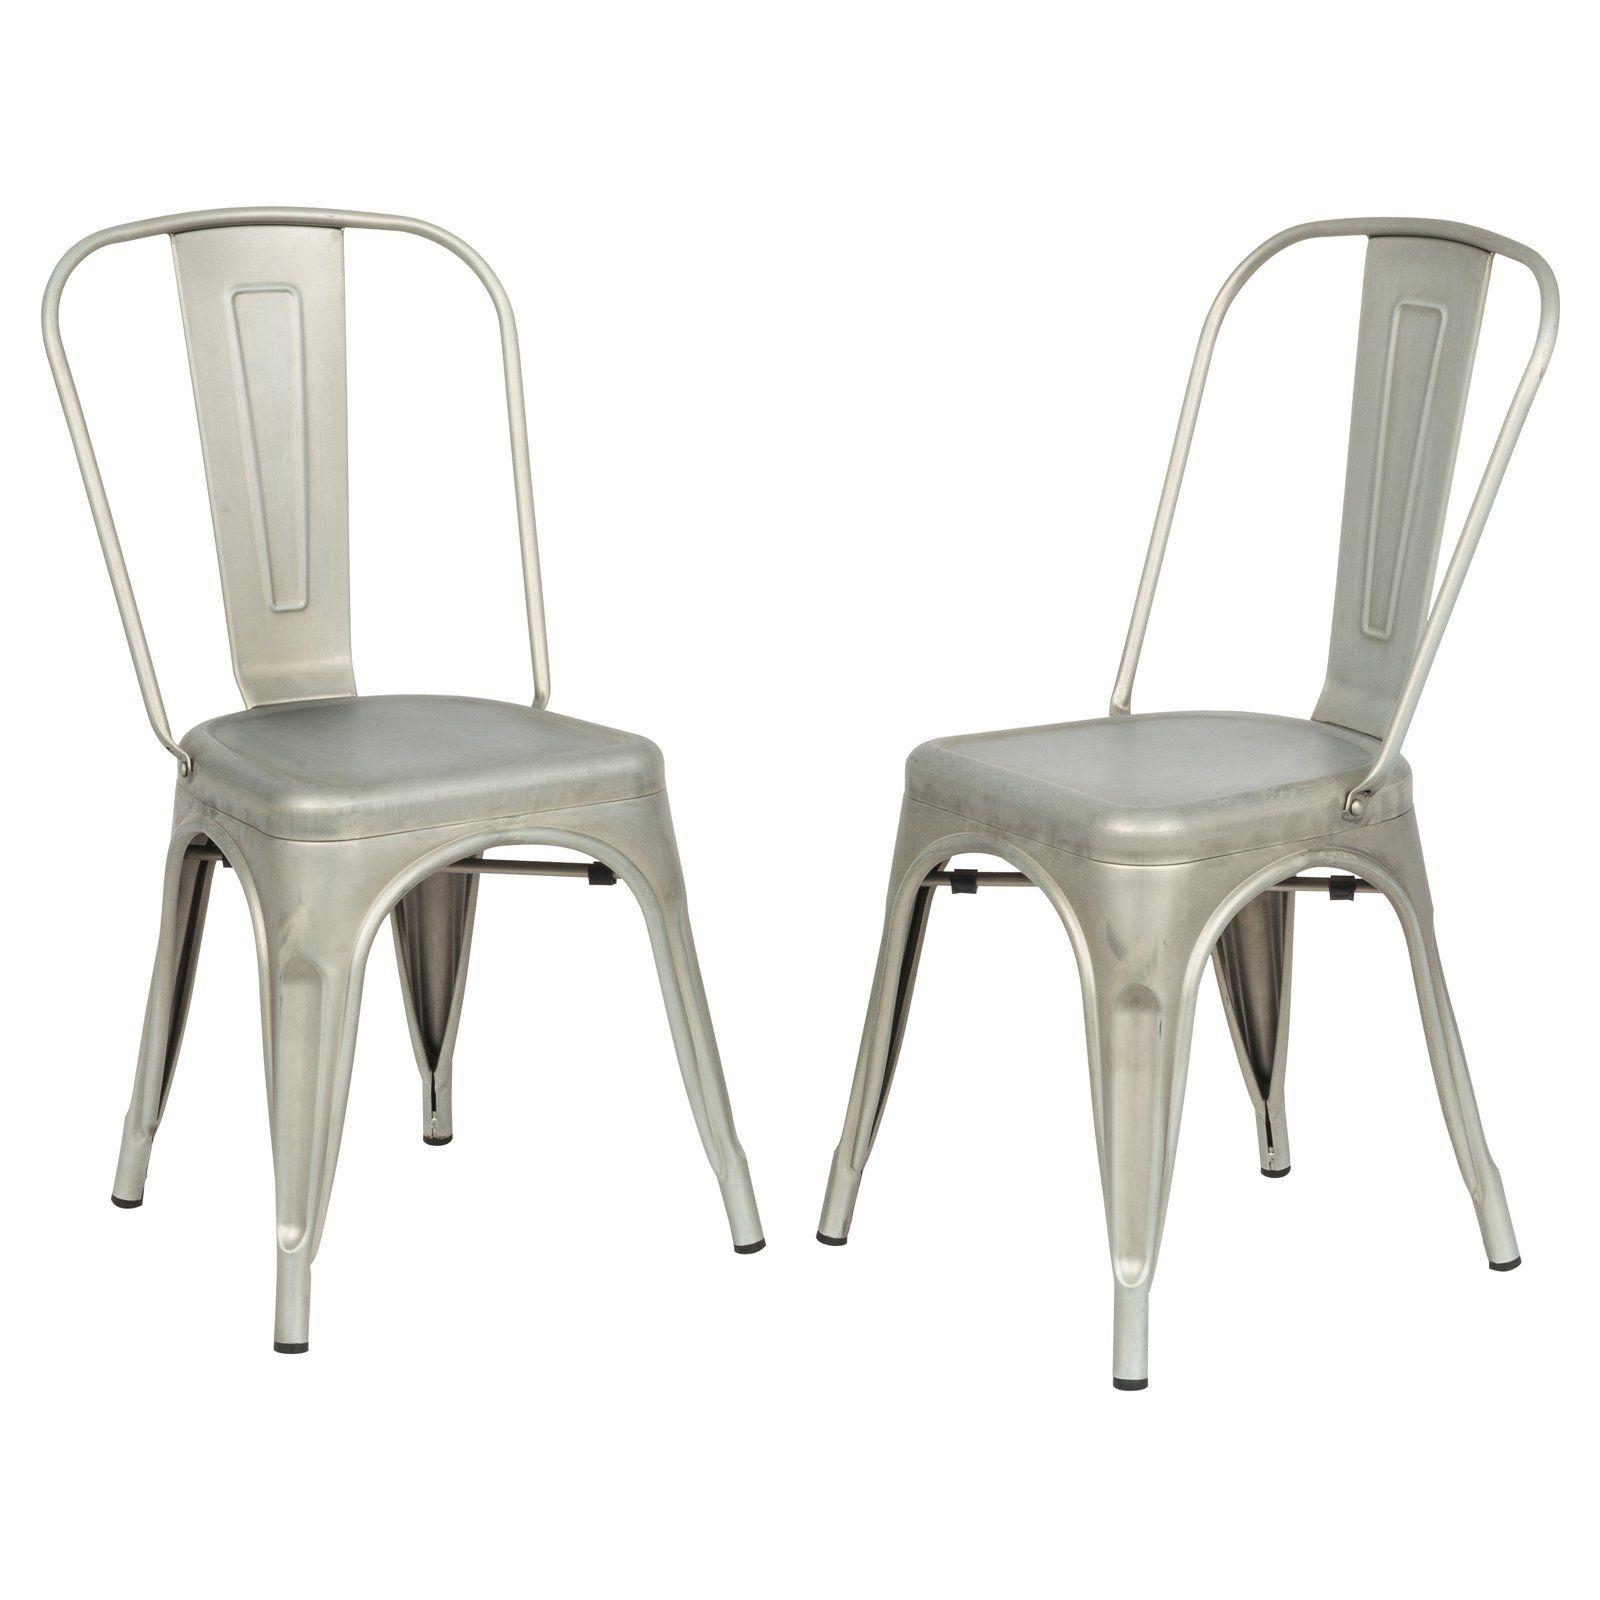 Carolina Chair Table Co Tabbart Splat Back Dining Chairs Set